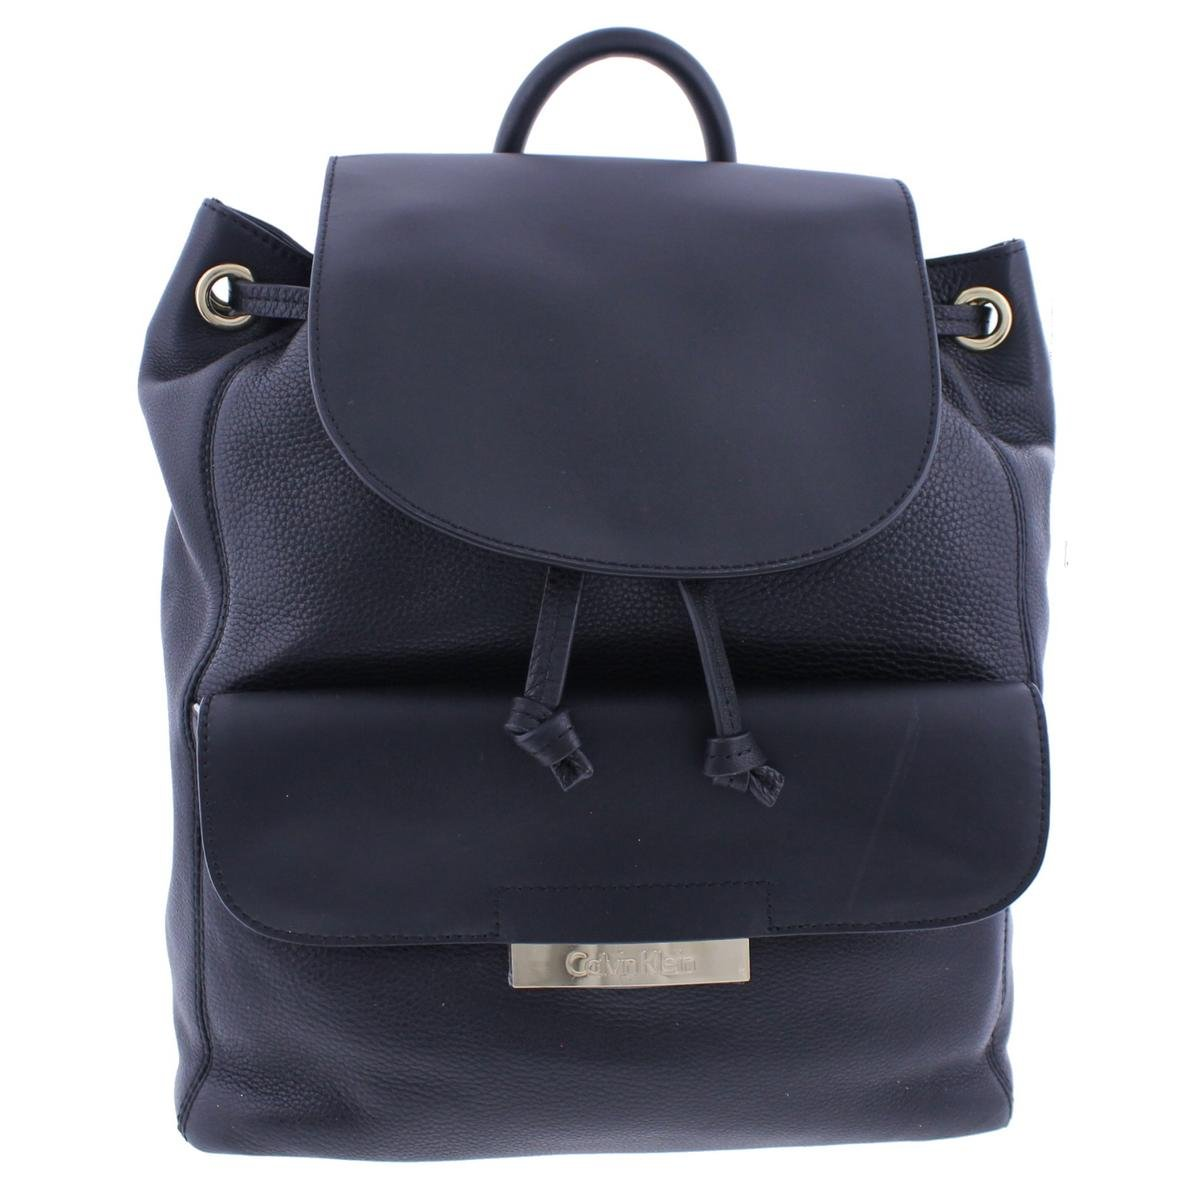 Calvin Klein Rowan Pebble Back pack, Black/Gold, One Size